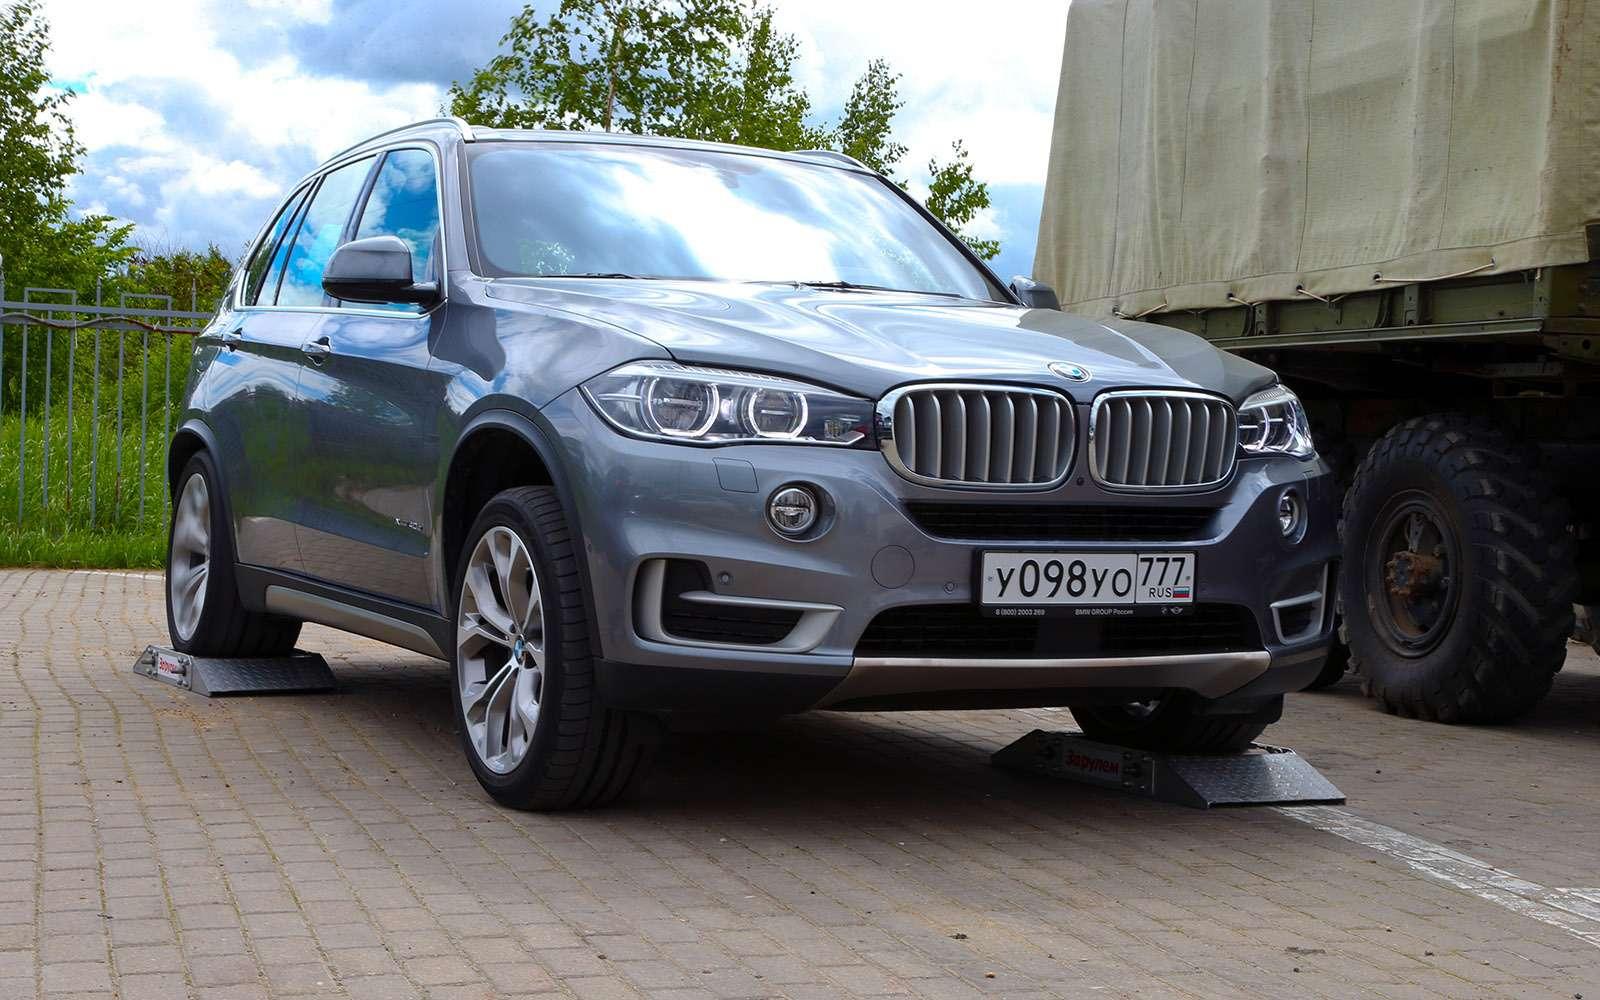 Новый Land Rover Discovery против конкурентов— тест ЗР— фото 784682